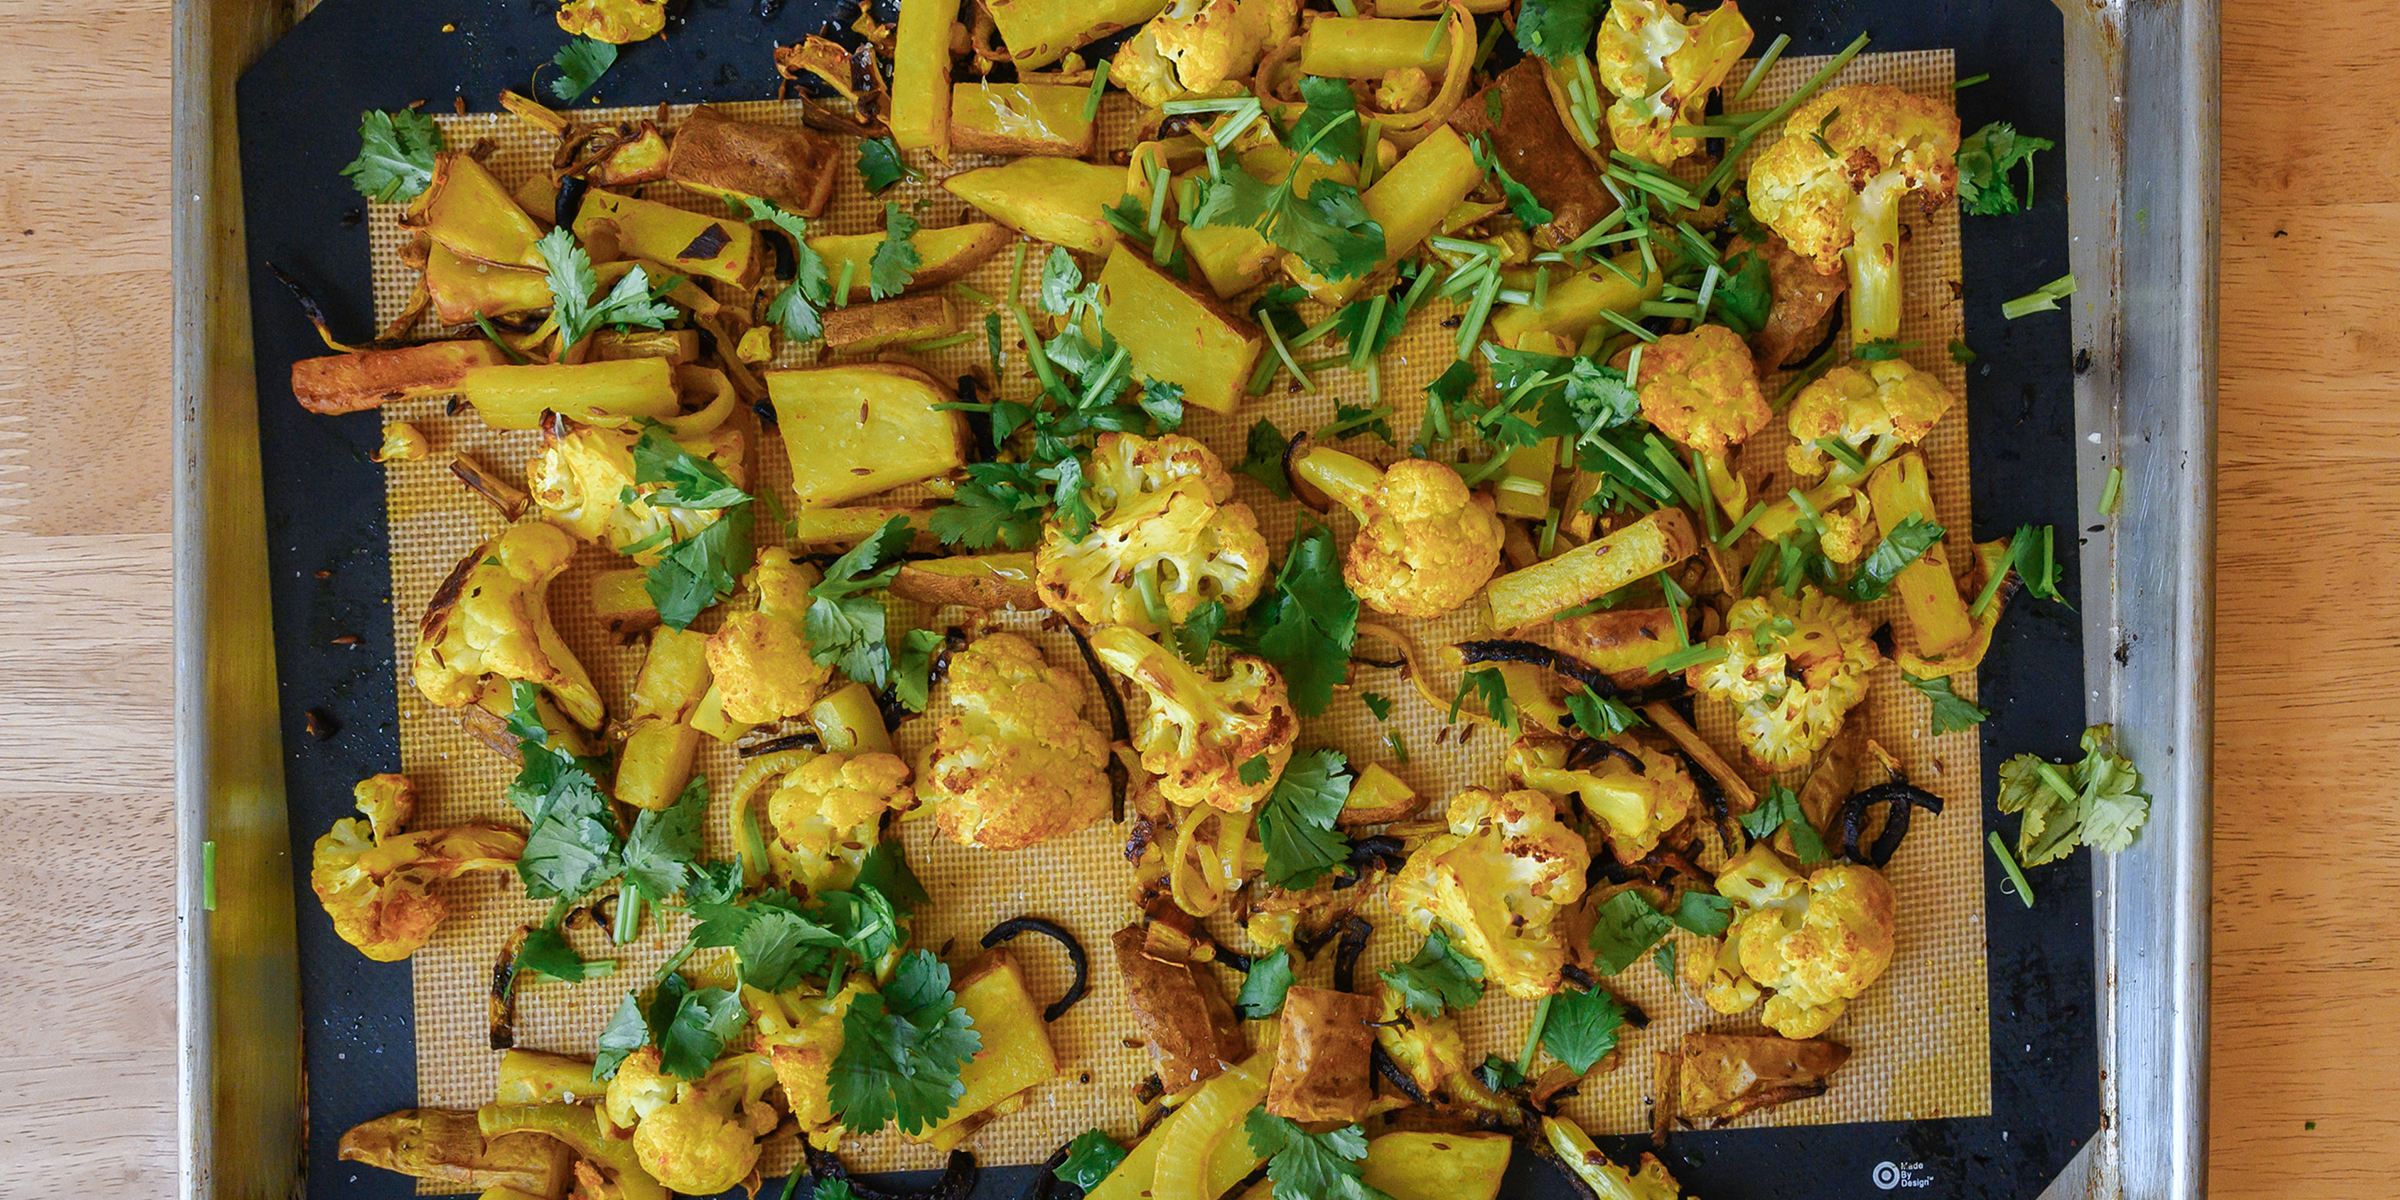 Priya Krishna makes potato and cauliflower aloo gobi all in one sheet pan